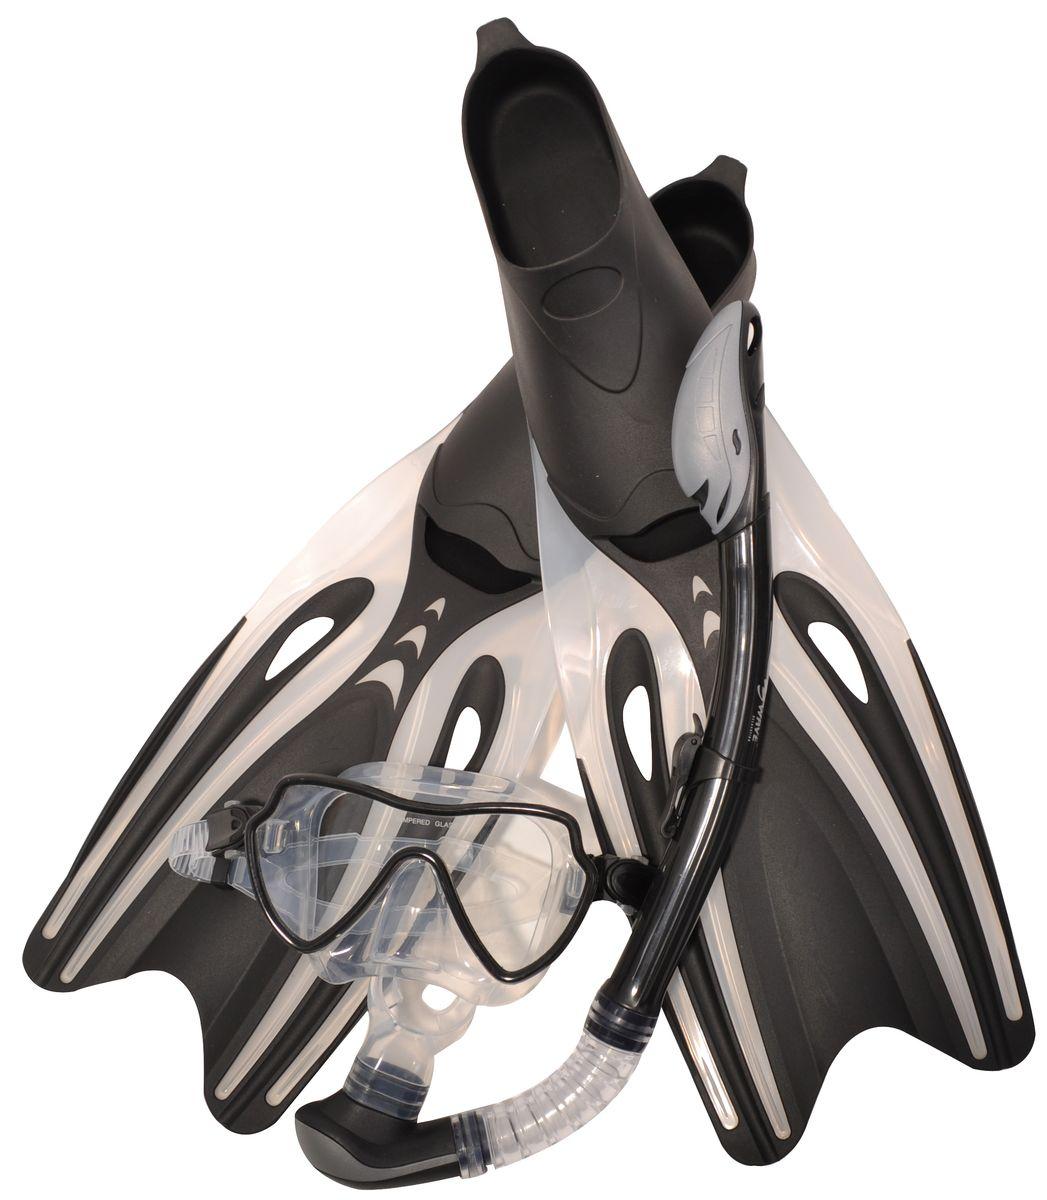 Комплект для плавания WAVE: маска, трубка, ласты, цвет: черый,серый. Размер 39-41. MSF-1390S65F69 маска для плавания wave цвет черный m 1314